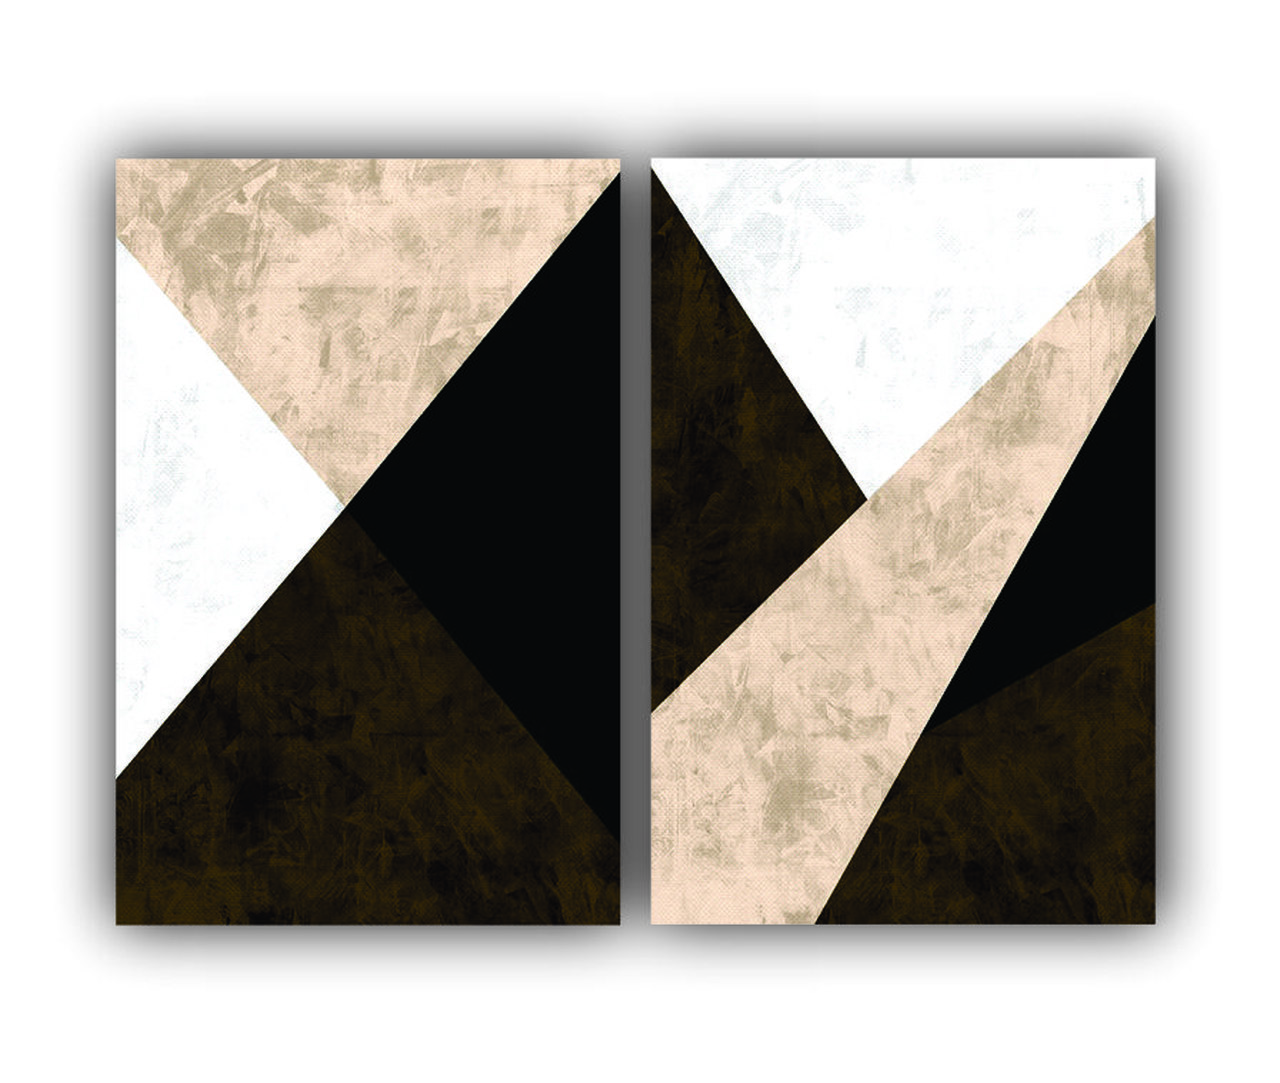 Quadro Abstrato Geométrico Marrom com Textura Moderno - Kit 2 telas